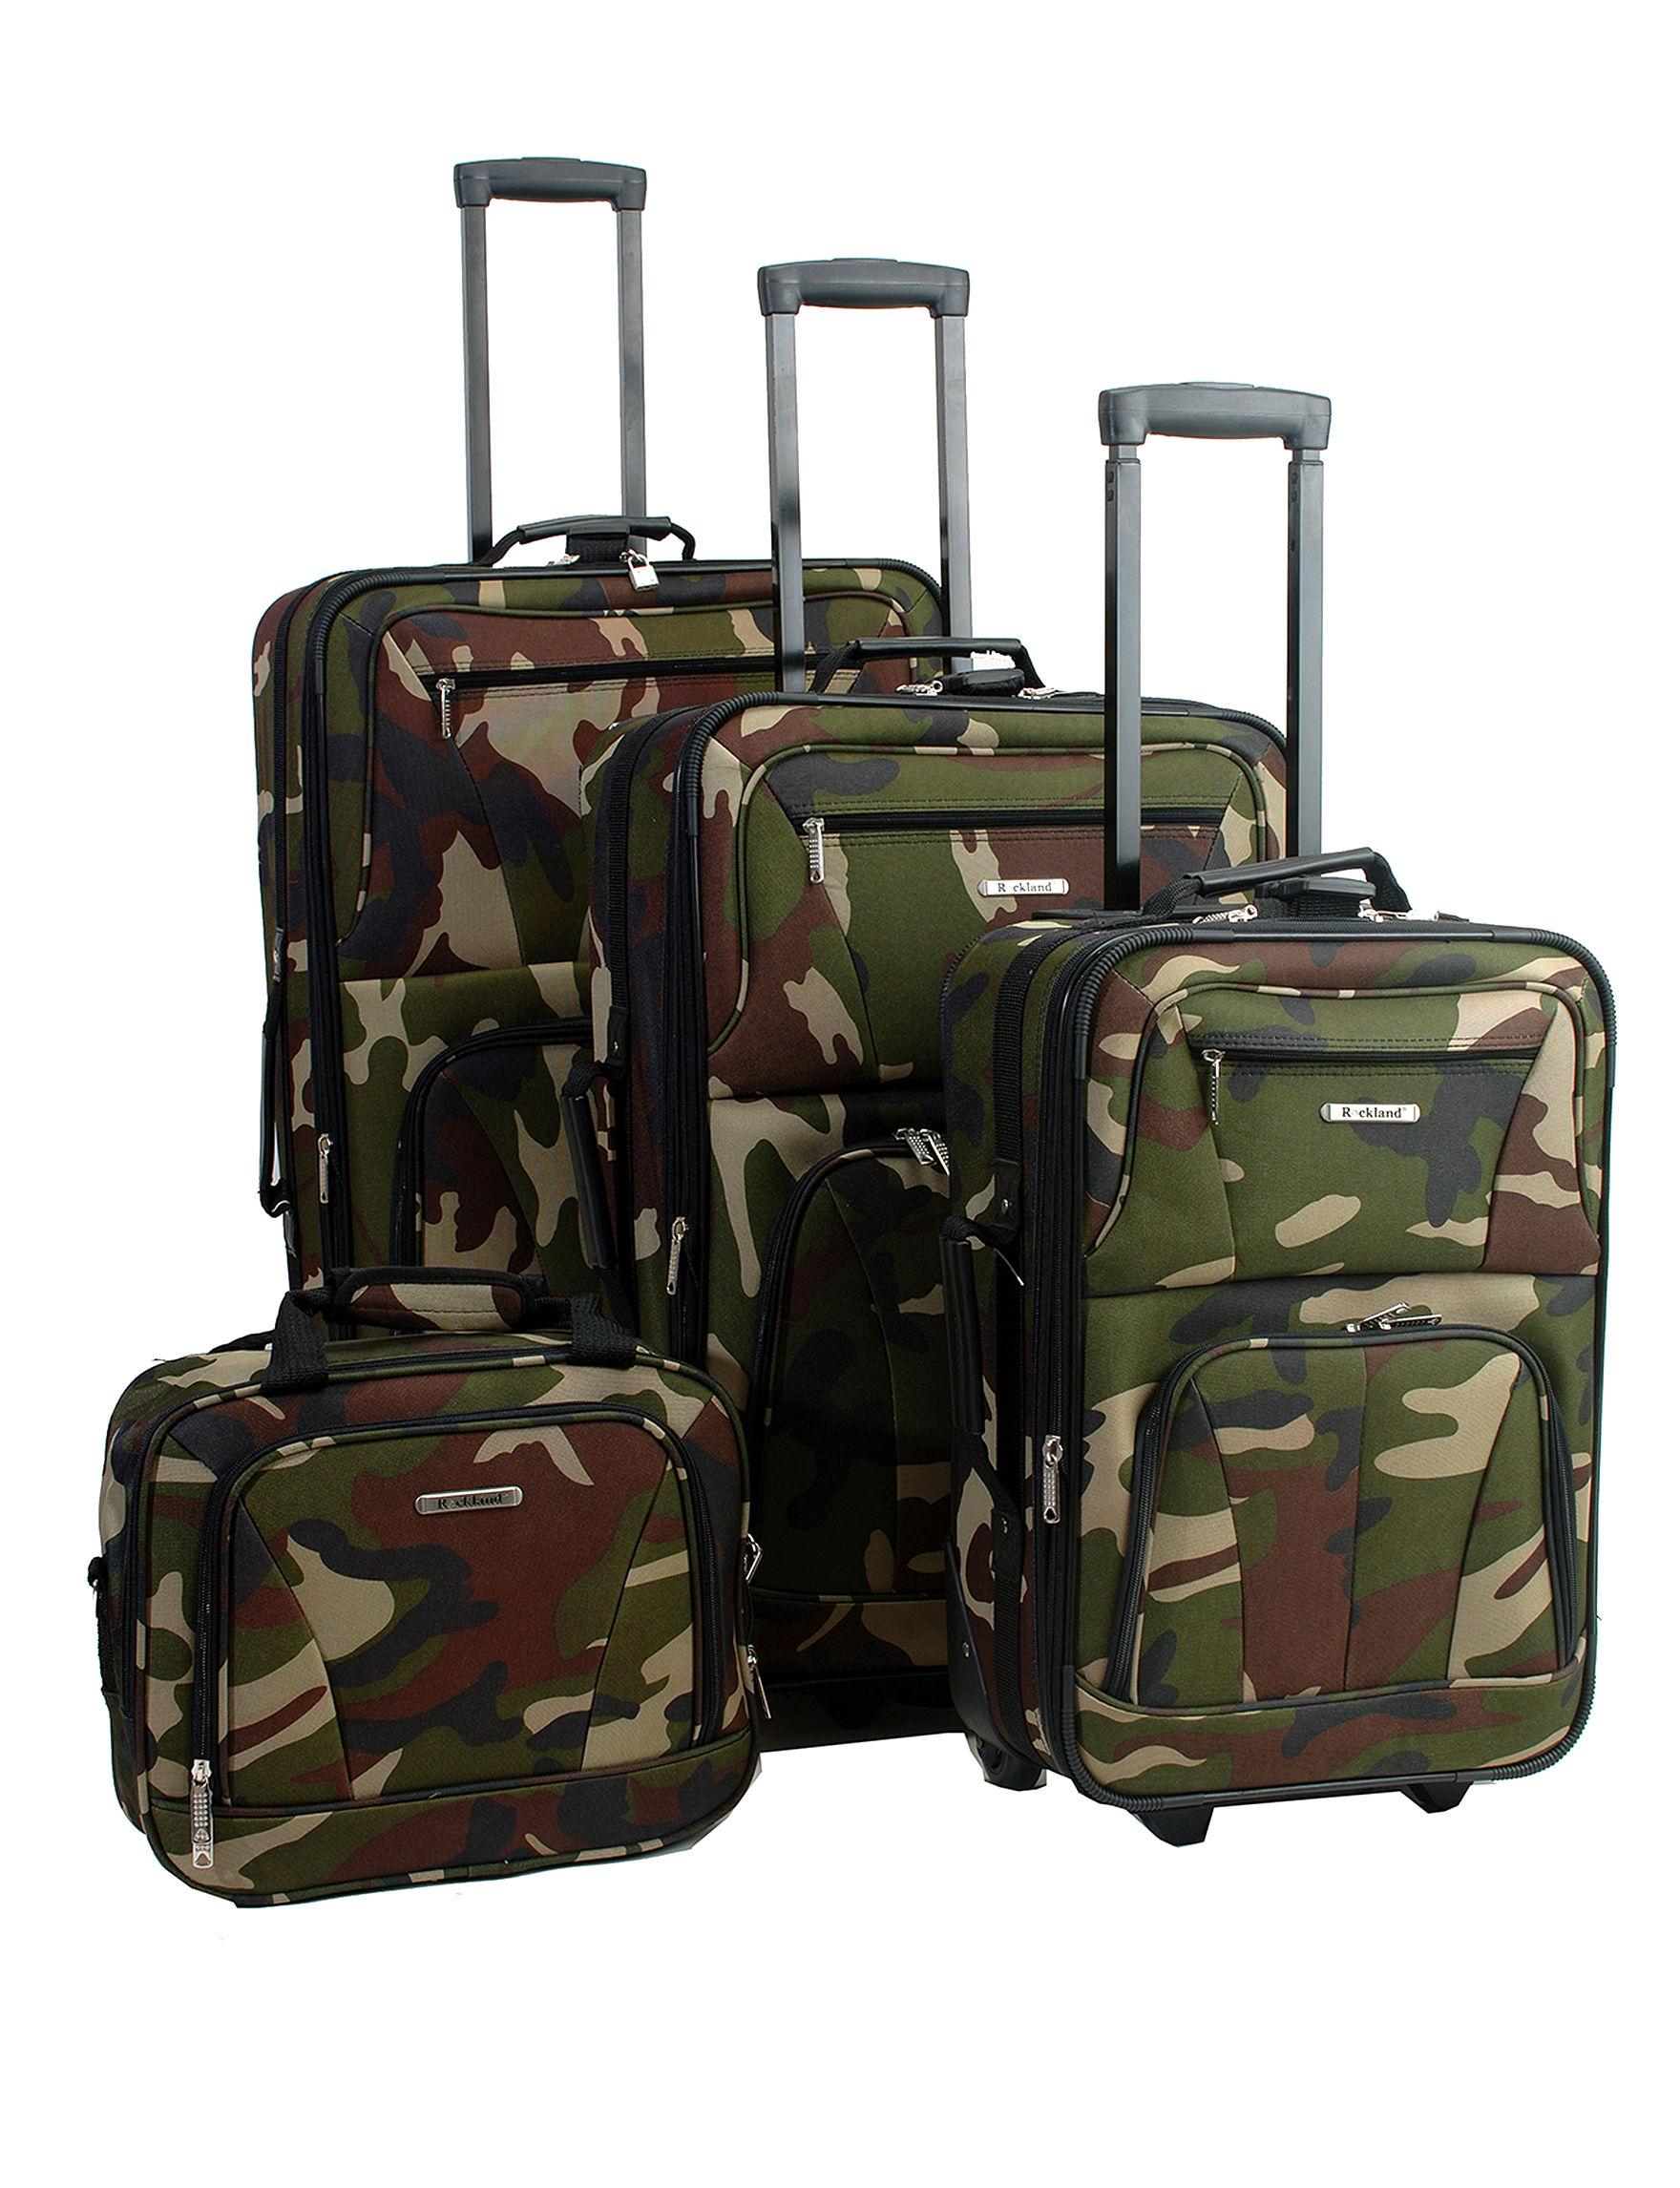 Rockland Green Camo Luggage Sets